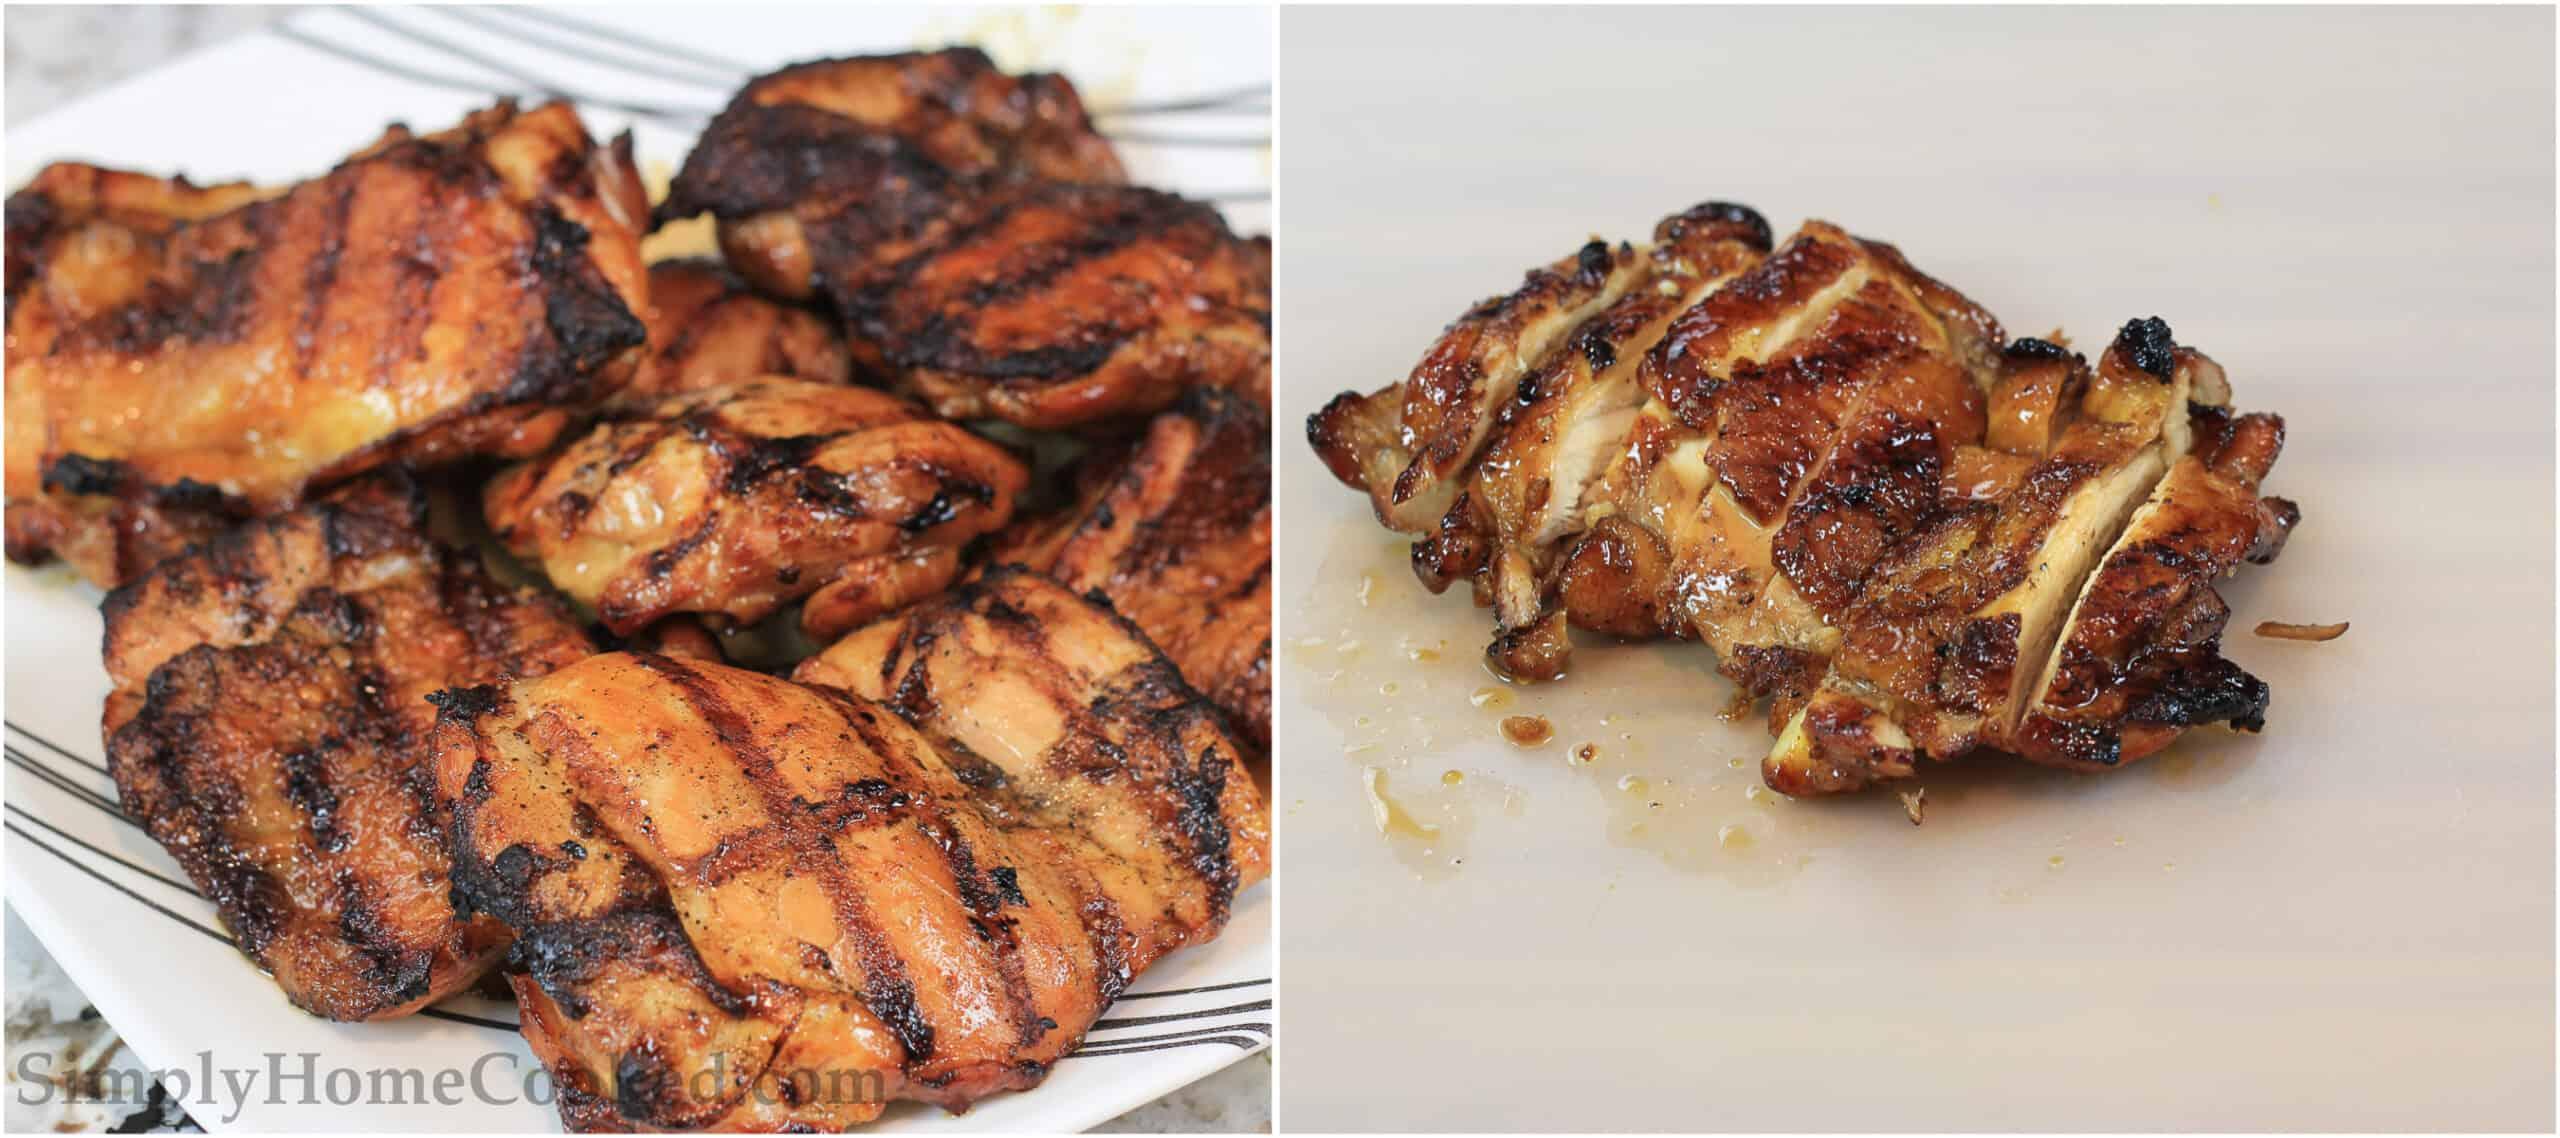 Grilled Teriyaki Chicken sliced